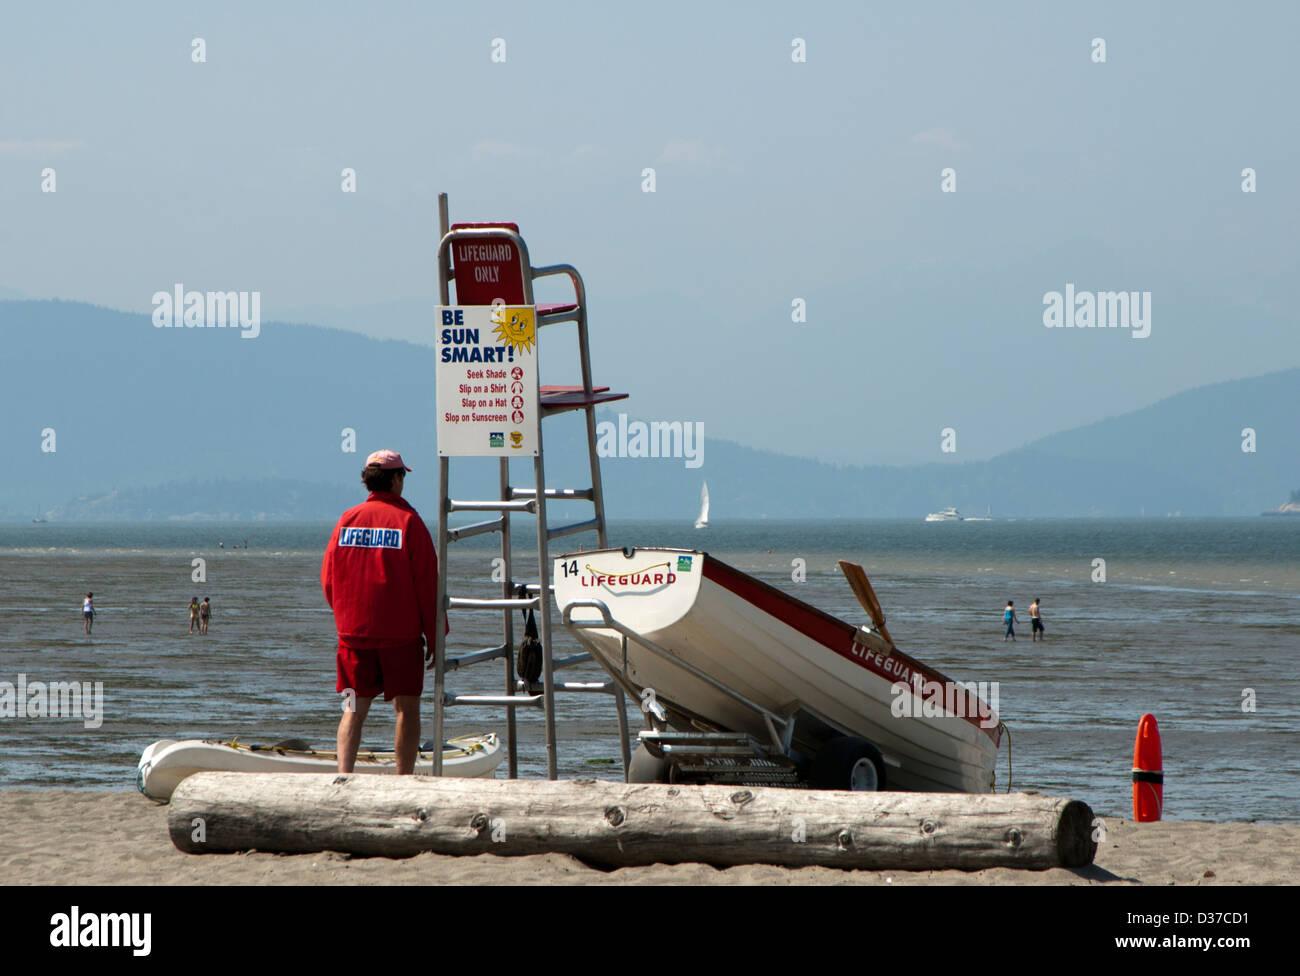 Lifeguard on duty , life saving station at the beach - Stock Image